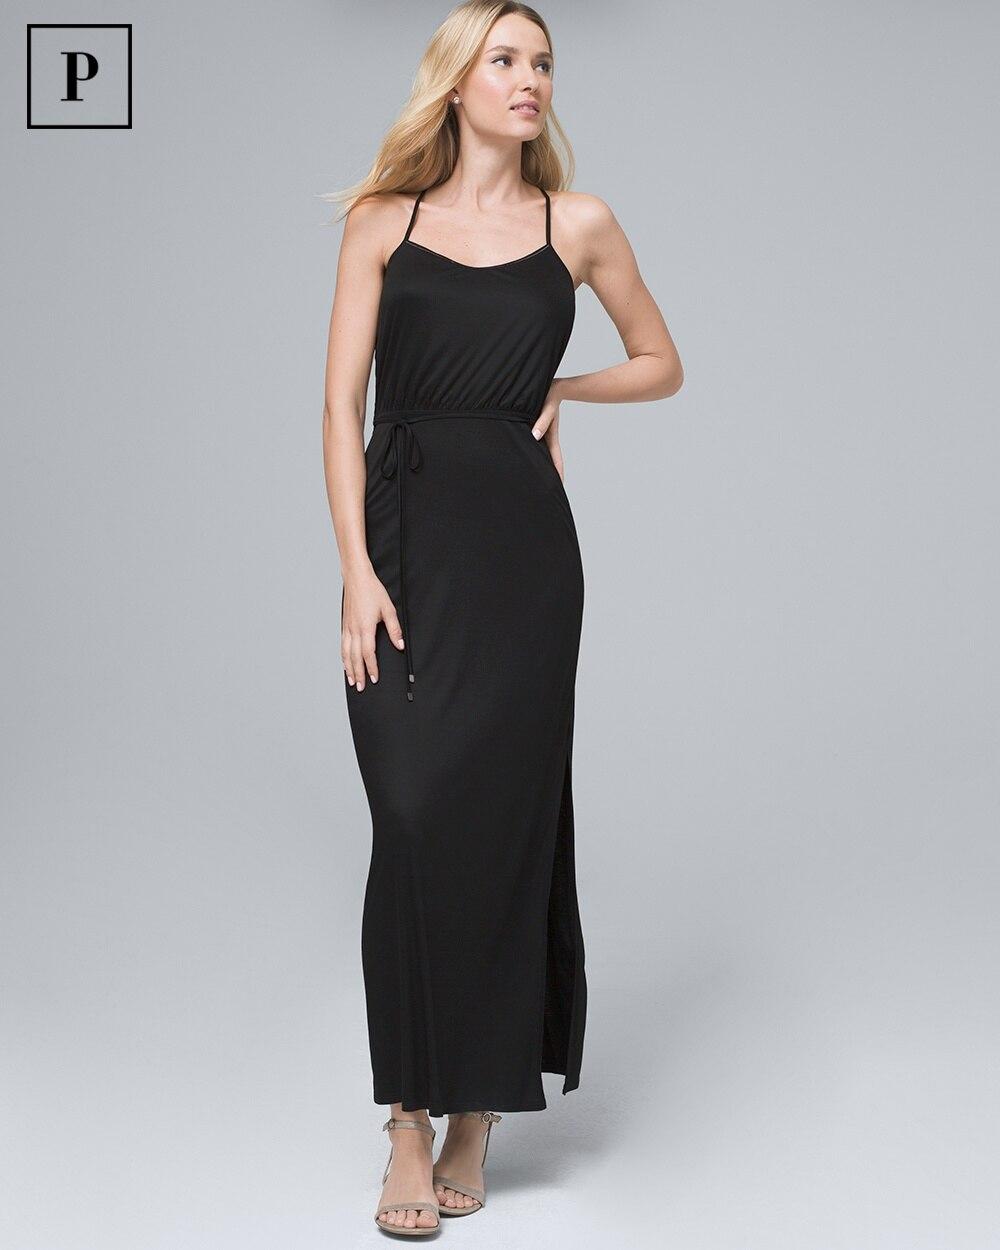 a04a9d0797e Petite Black Knit Maxi Dress - White House Black Market